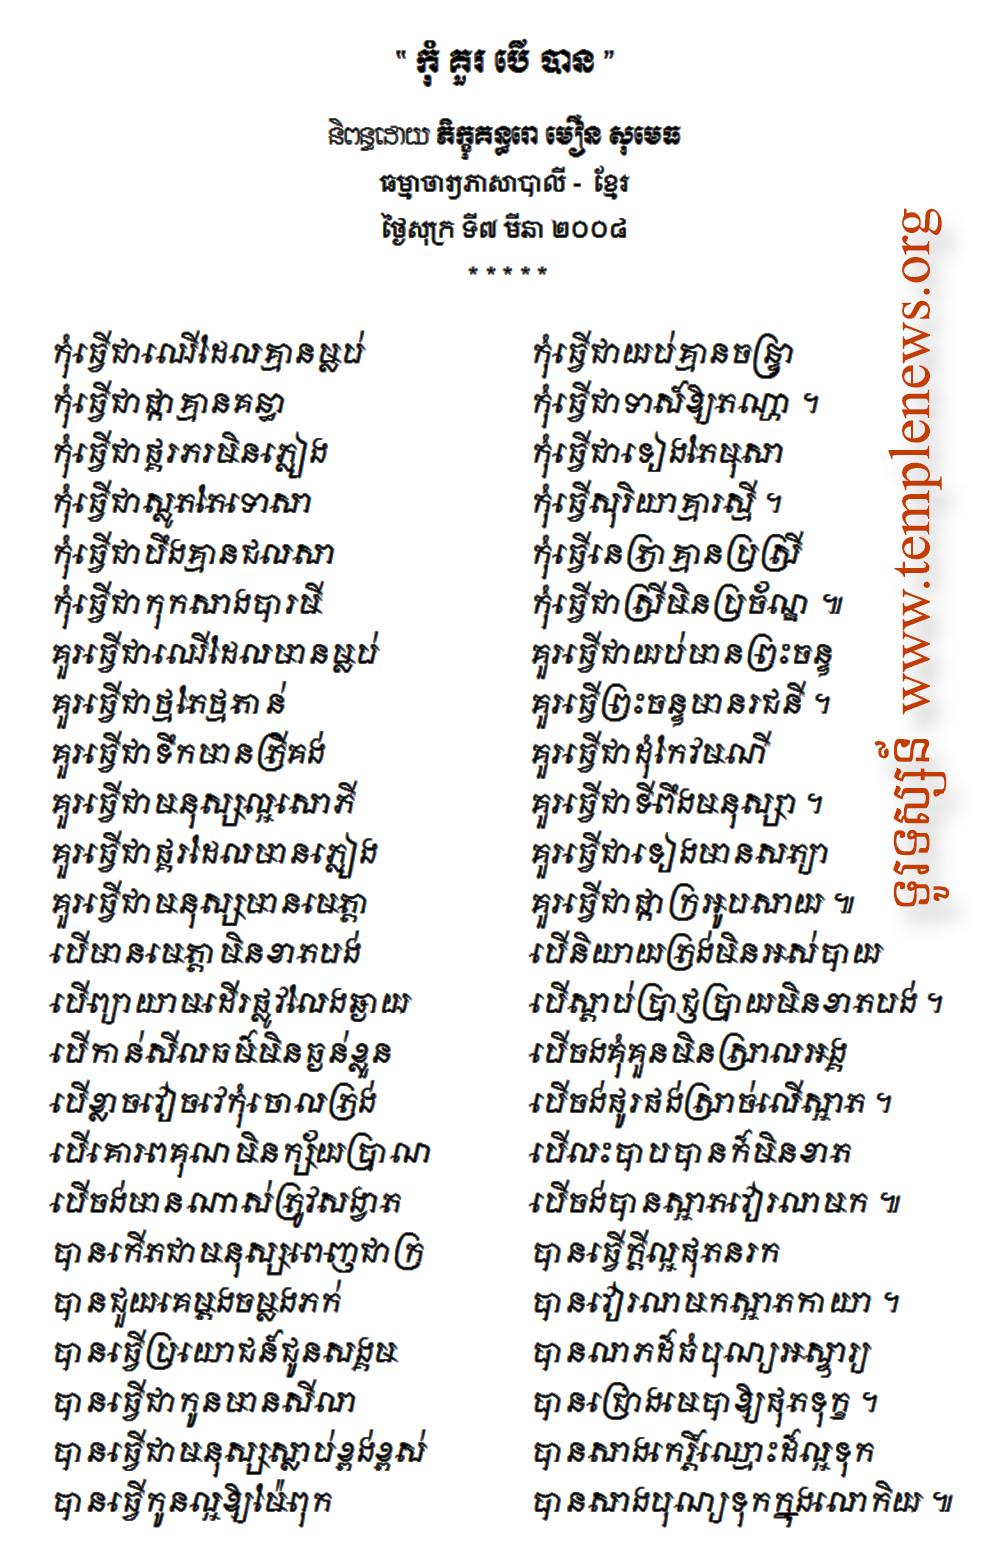 poemHardtobebornashumans